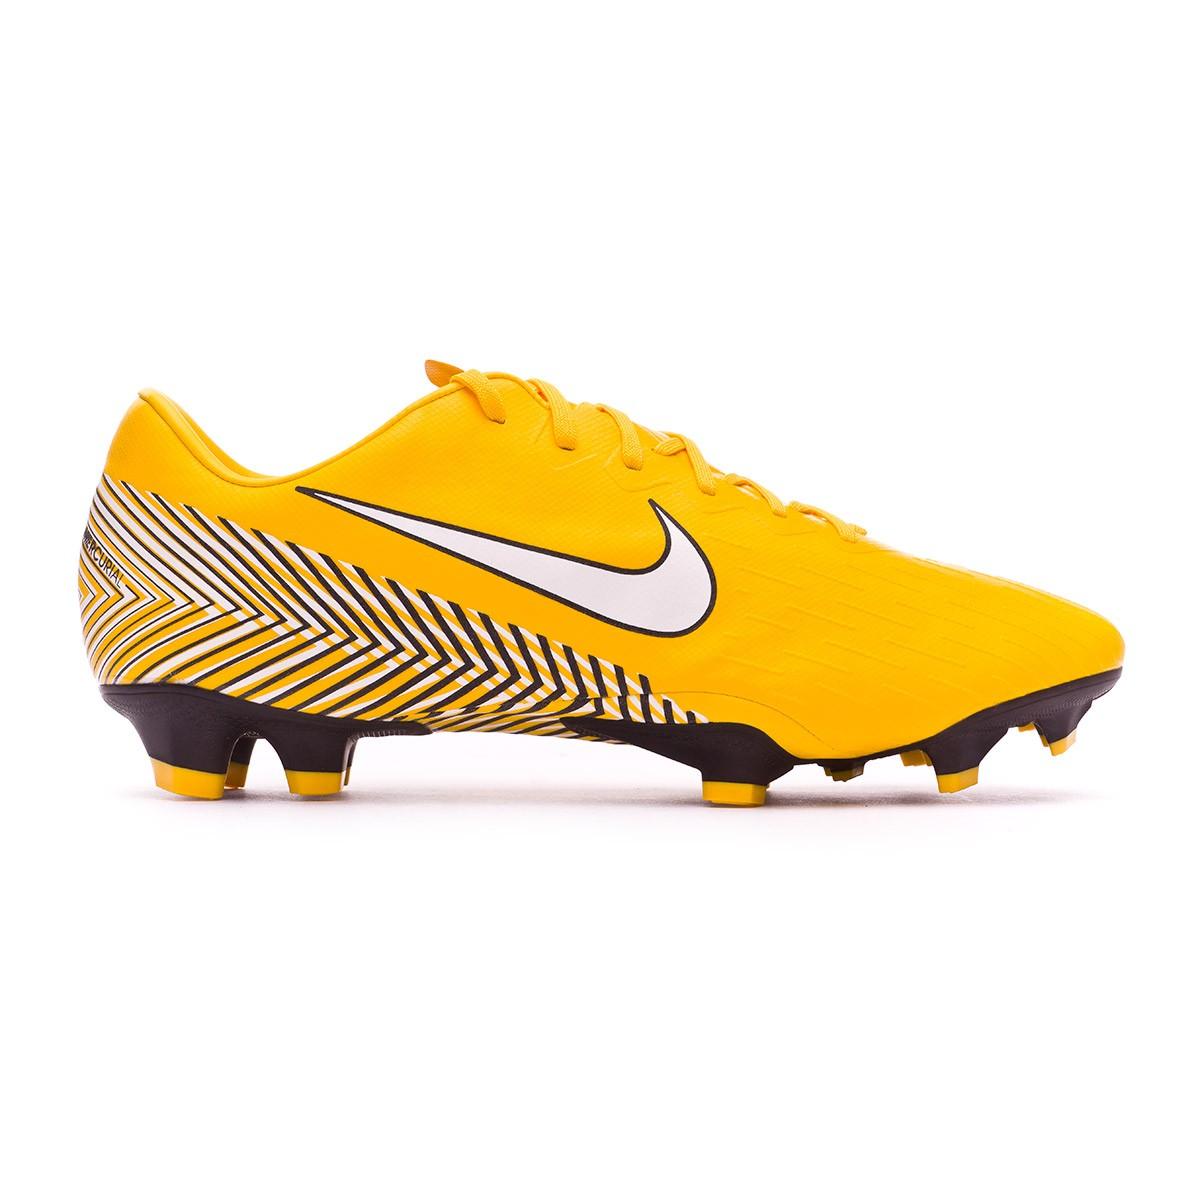 0e68e398c Football Boots Nike Mercurial Vapor XII Pro FG Neymar Yellow-Black -  Football store Fútbol Emotion